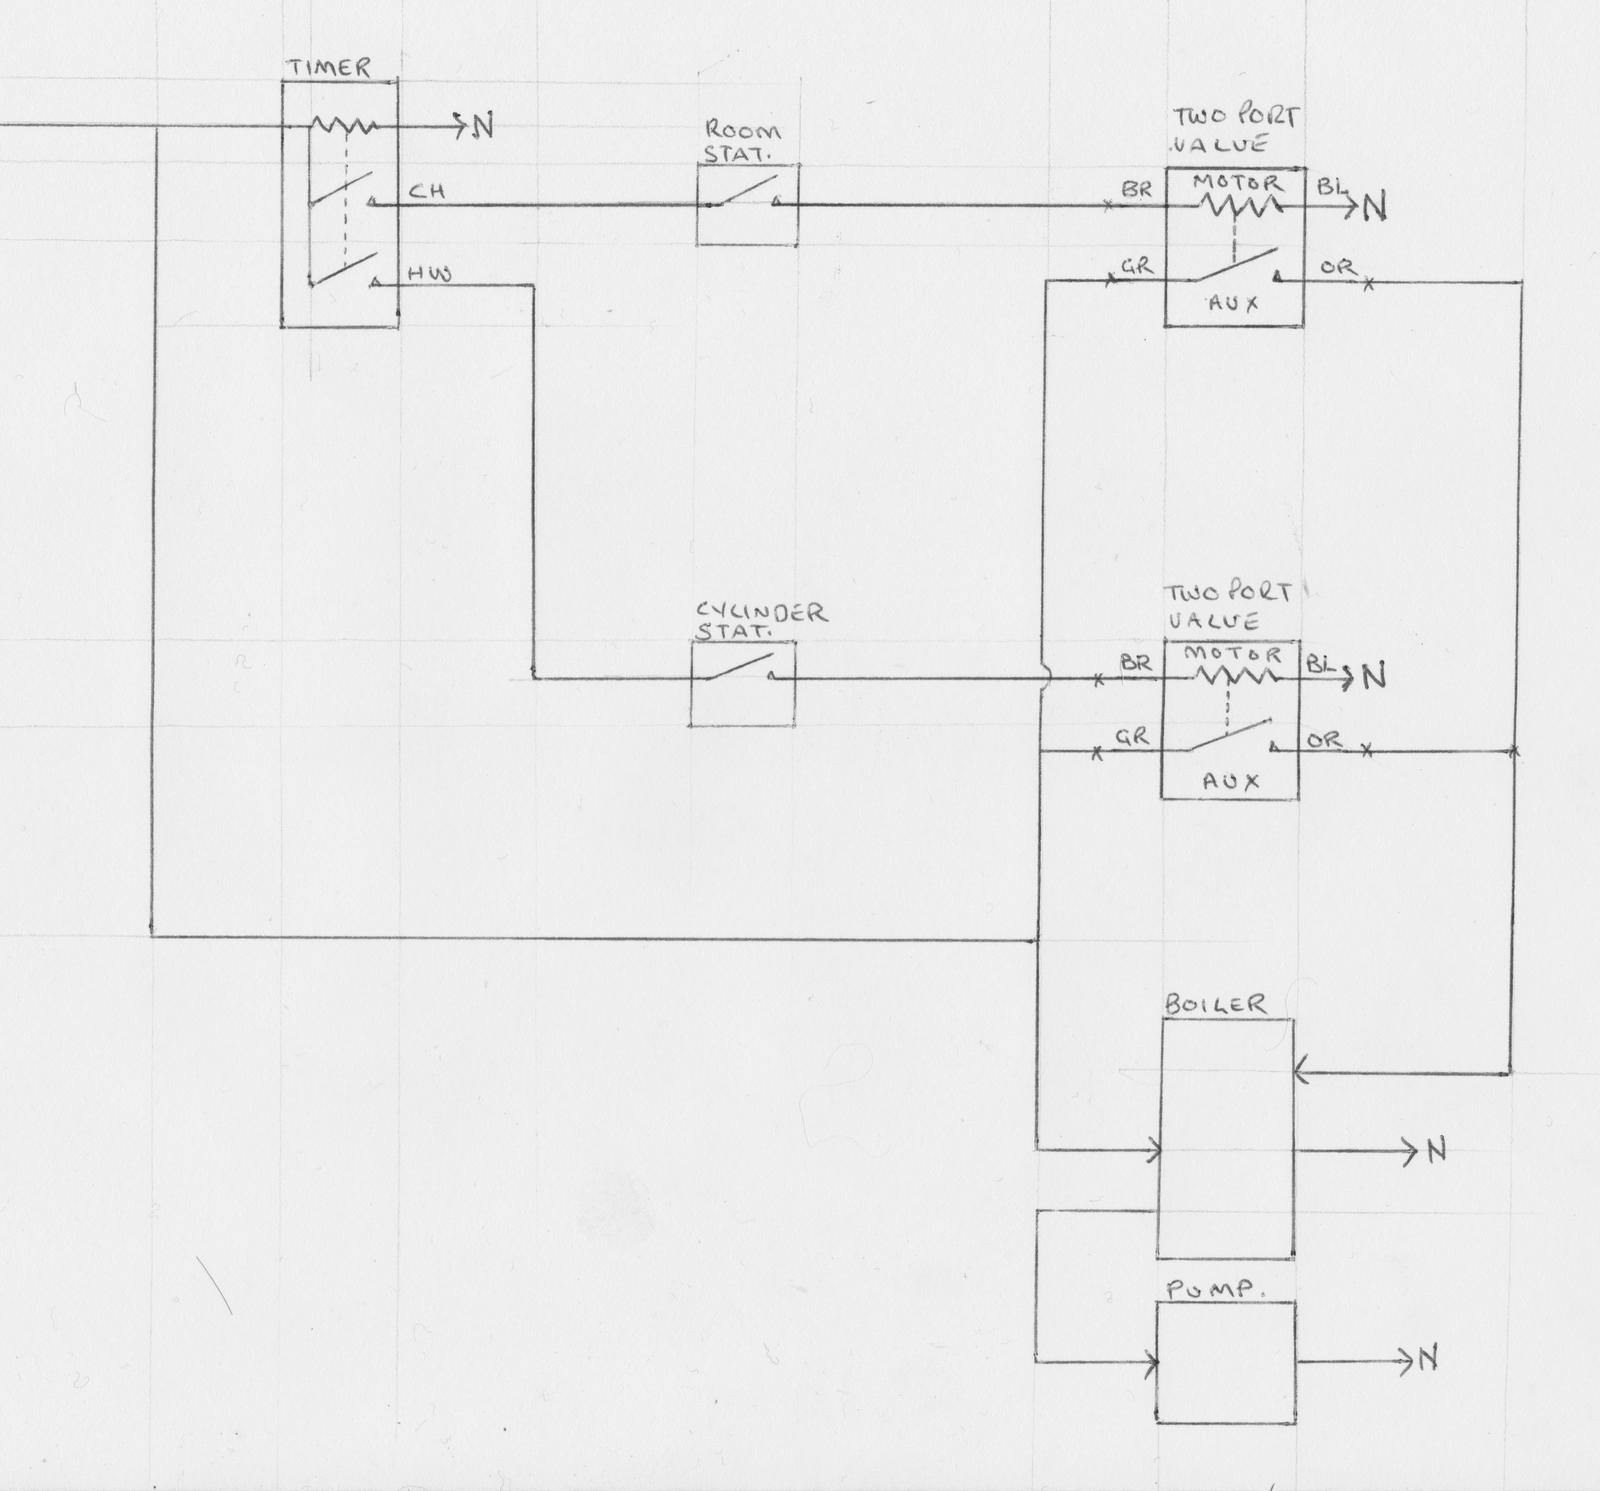 honeywell s plan wiring diagram frost stat kawasaki bayou 300 4x4 the technicians handbook